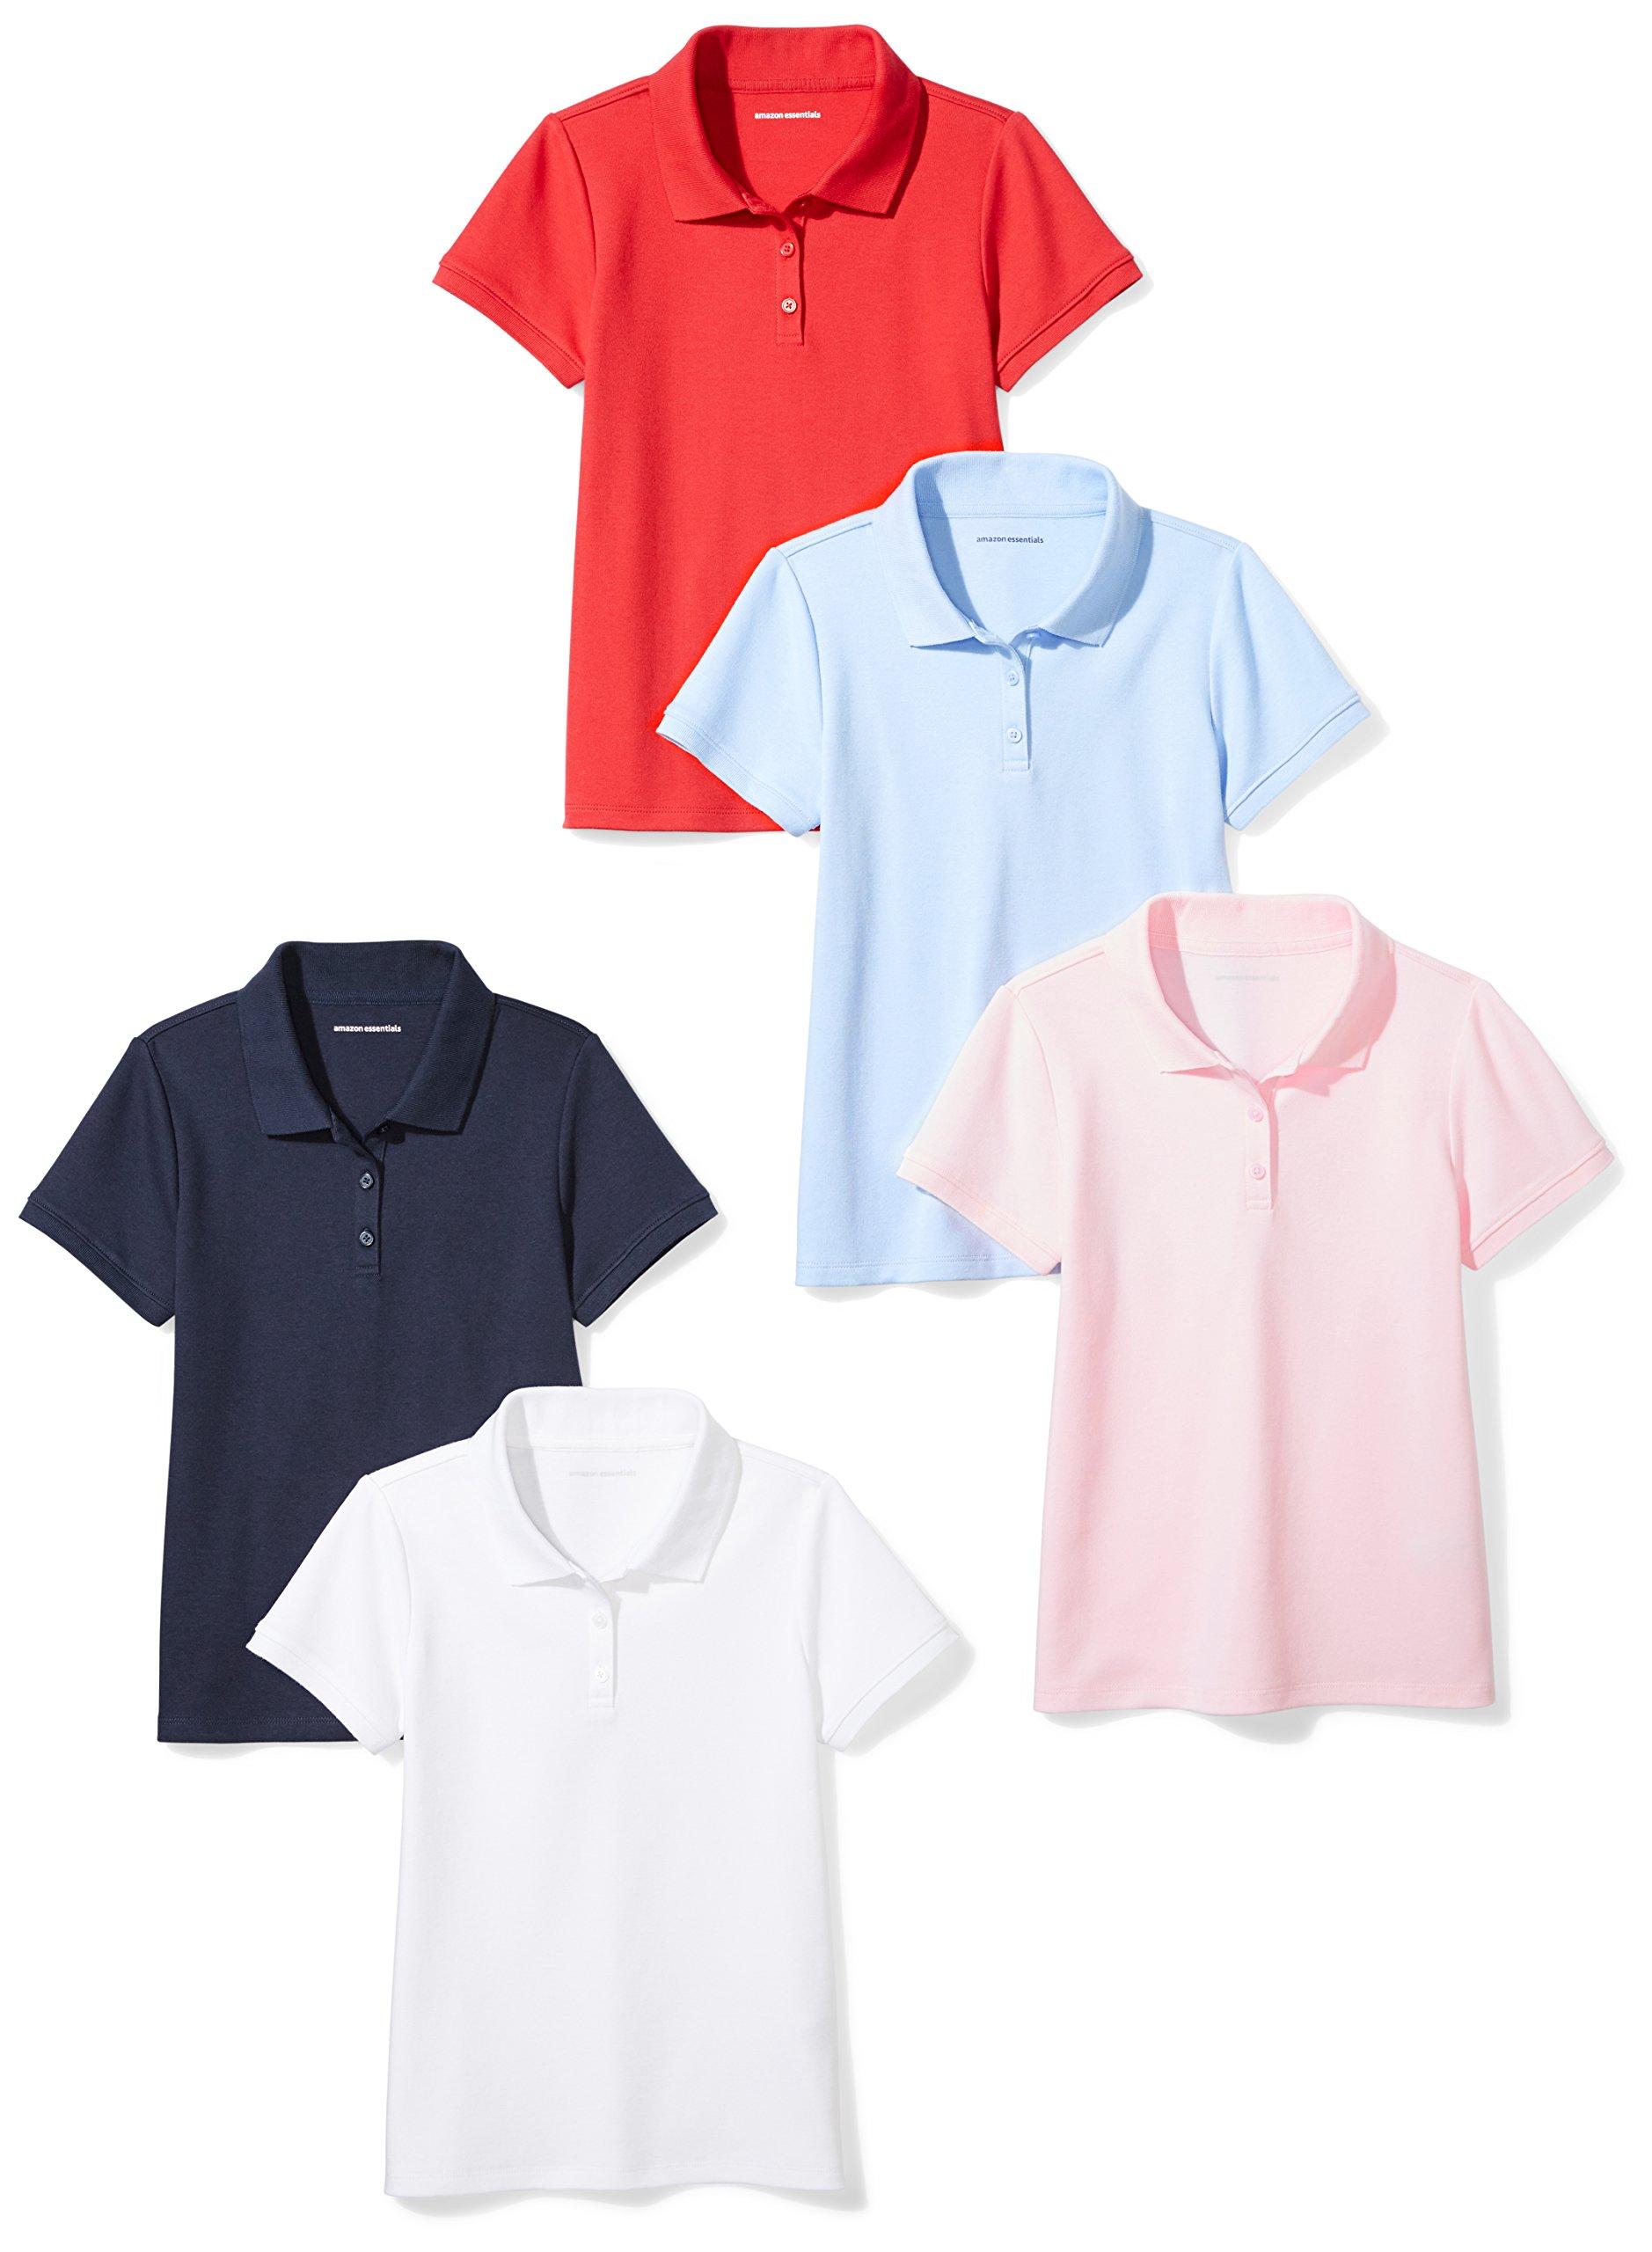 Amazon Essentials Girls' 5-Pack Short-Sleeve Uniform Interlock Polo, Multi Pack, XL (12)